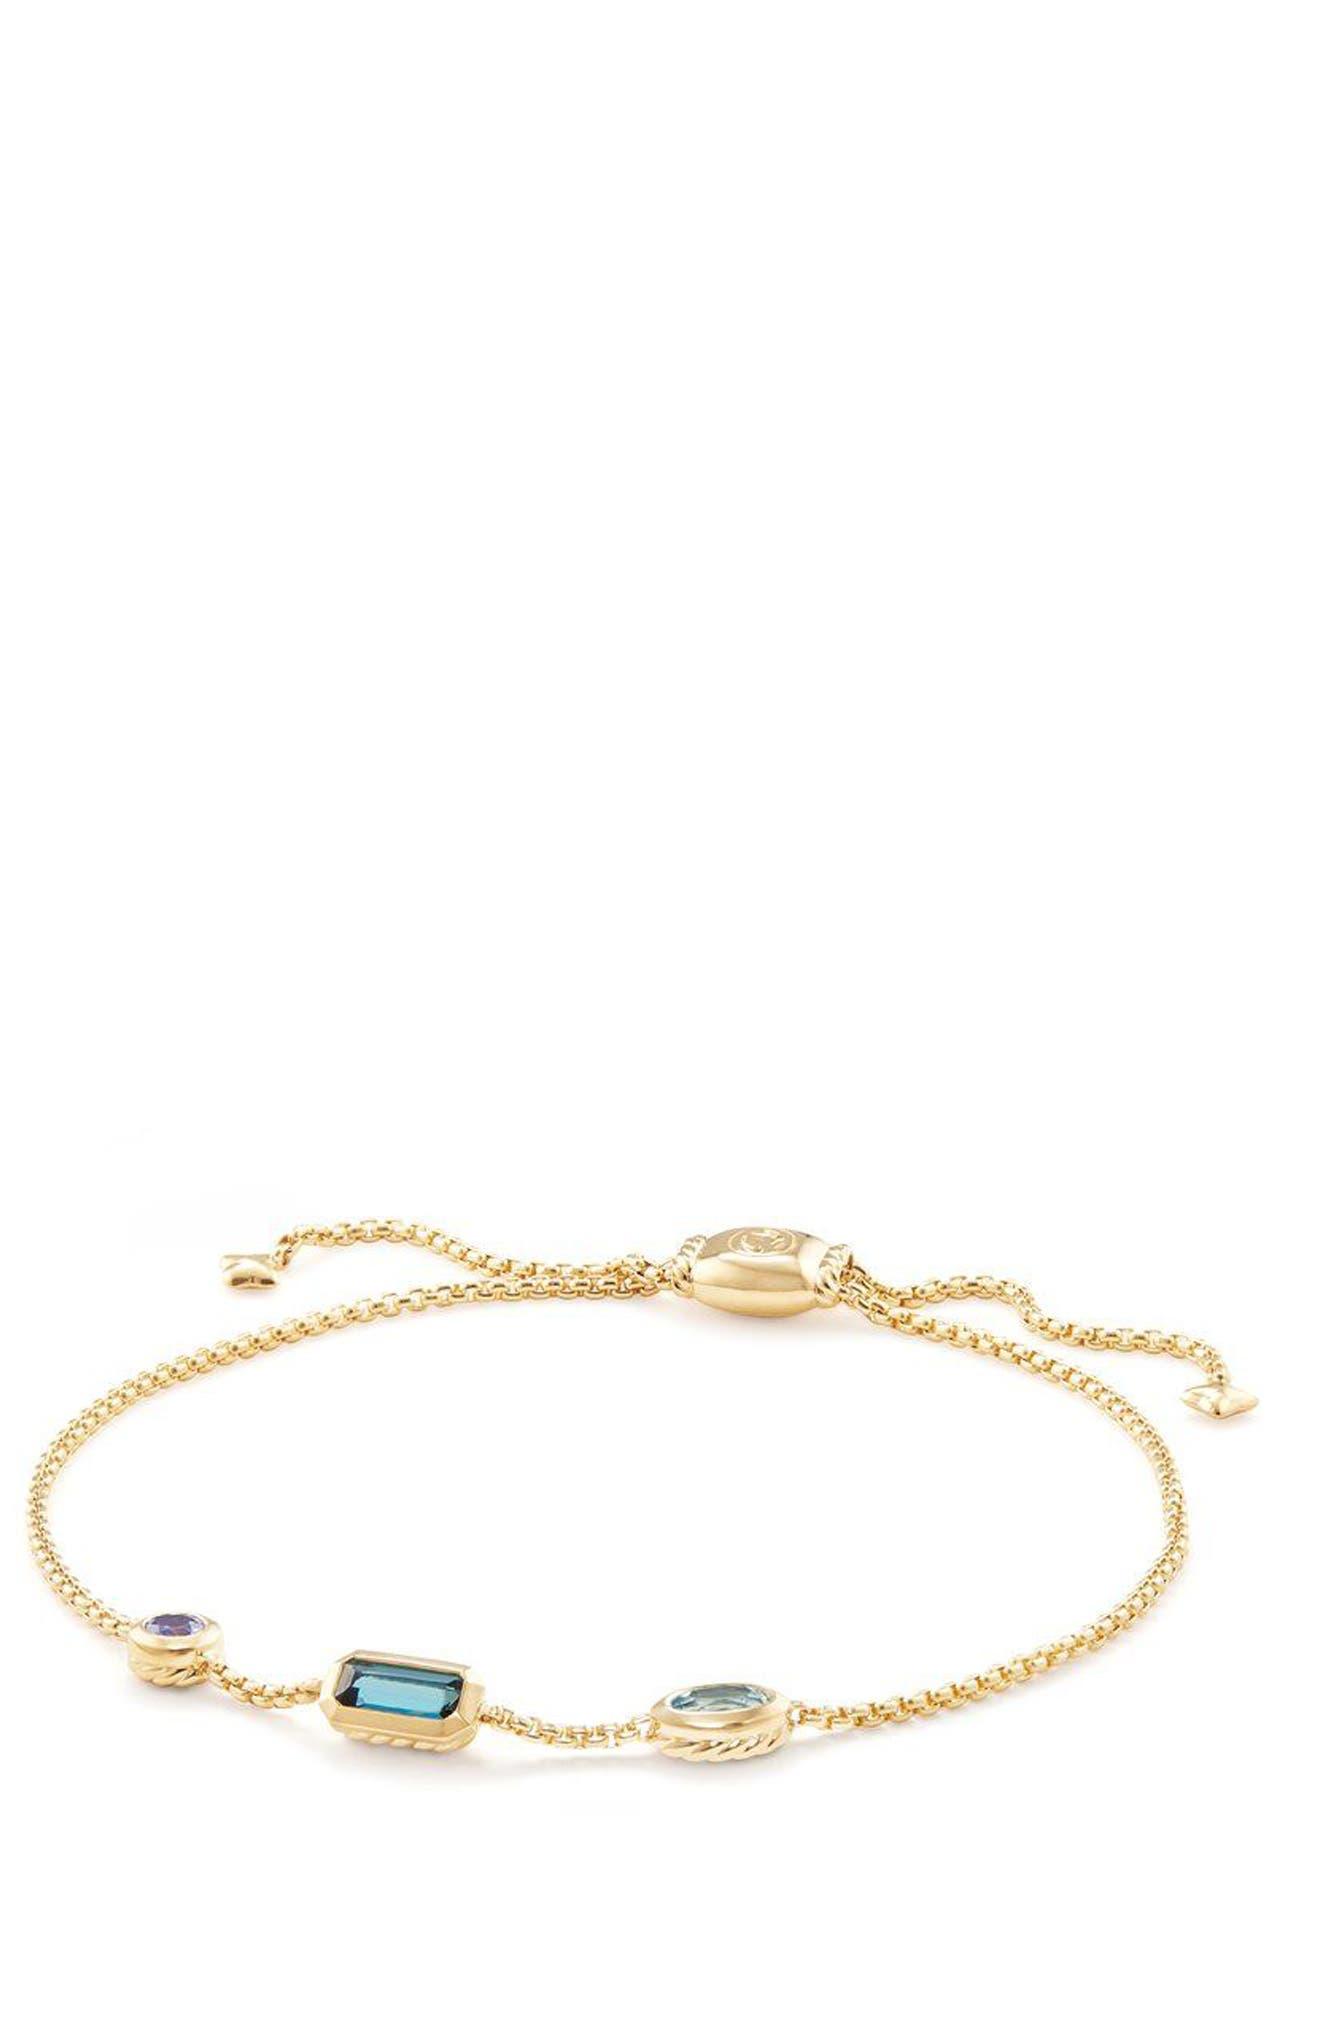 Novella Chain Bracelet in 18K Gold,                         Main,                         color, GOLD/ HAMPTON BLUE TOPAZ